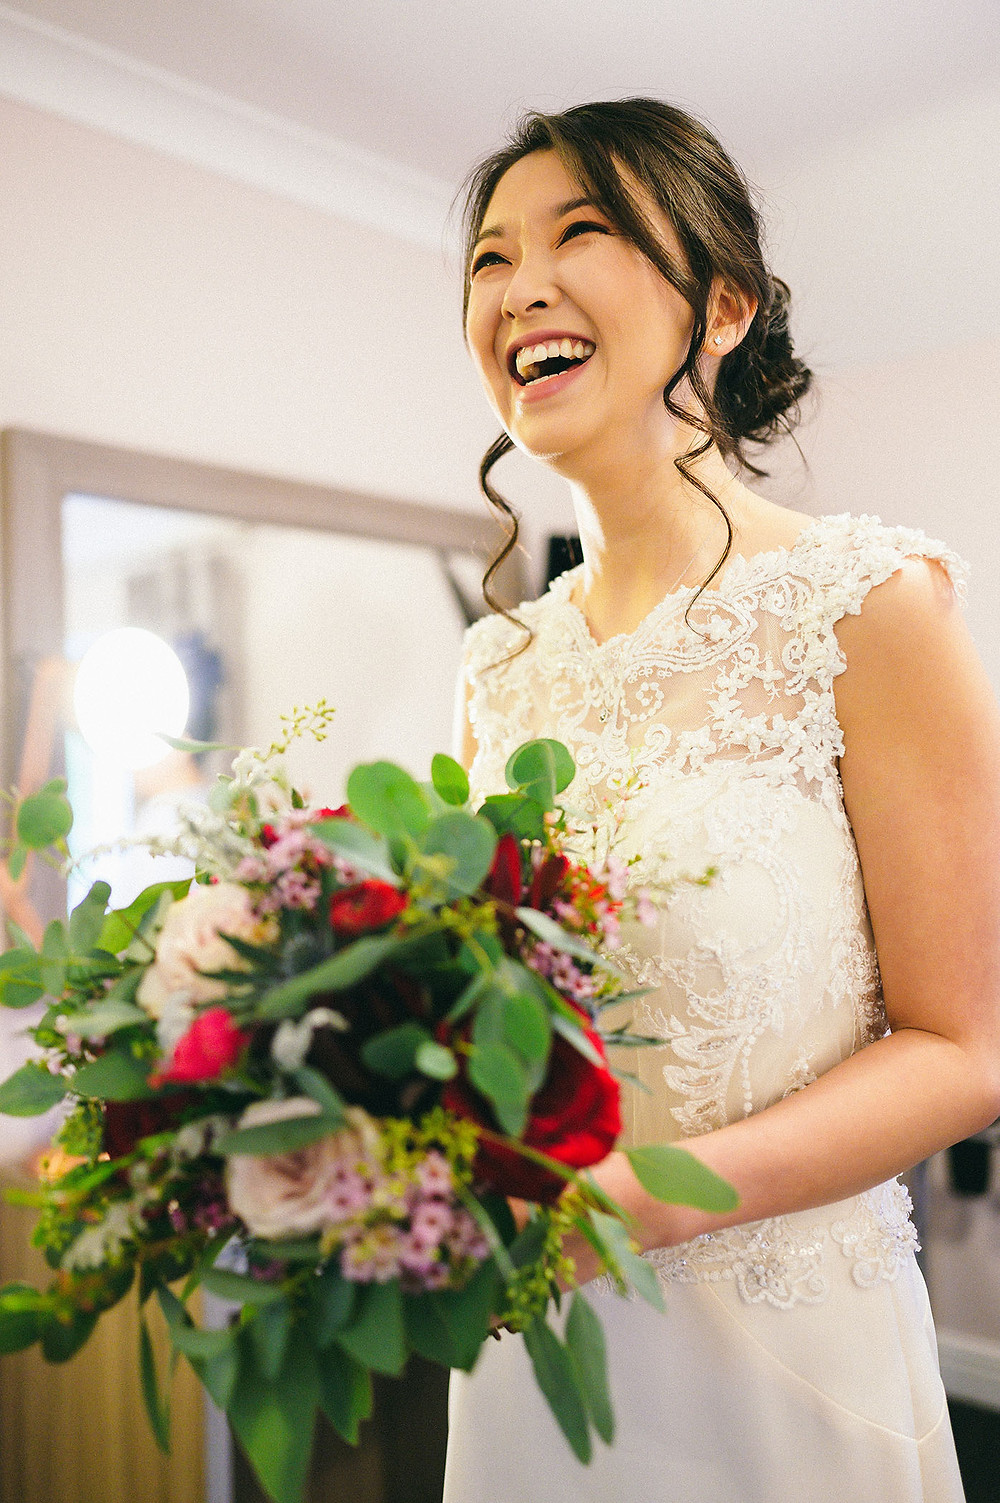 Rookery Hall Wedding Photographer, Cheshire Woodlands Wedding Photographer, Slaters Country Inn Wedding Photographer